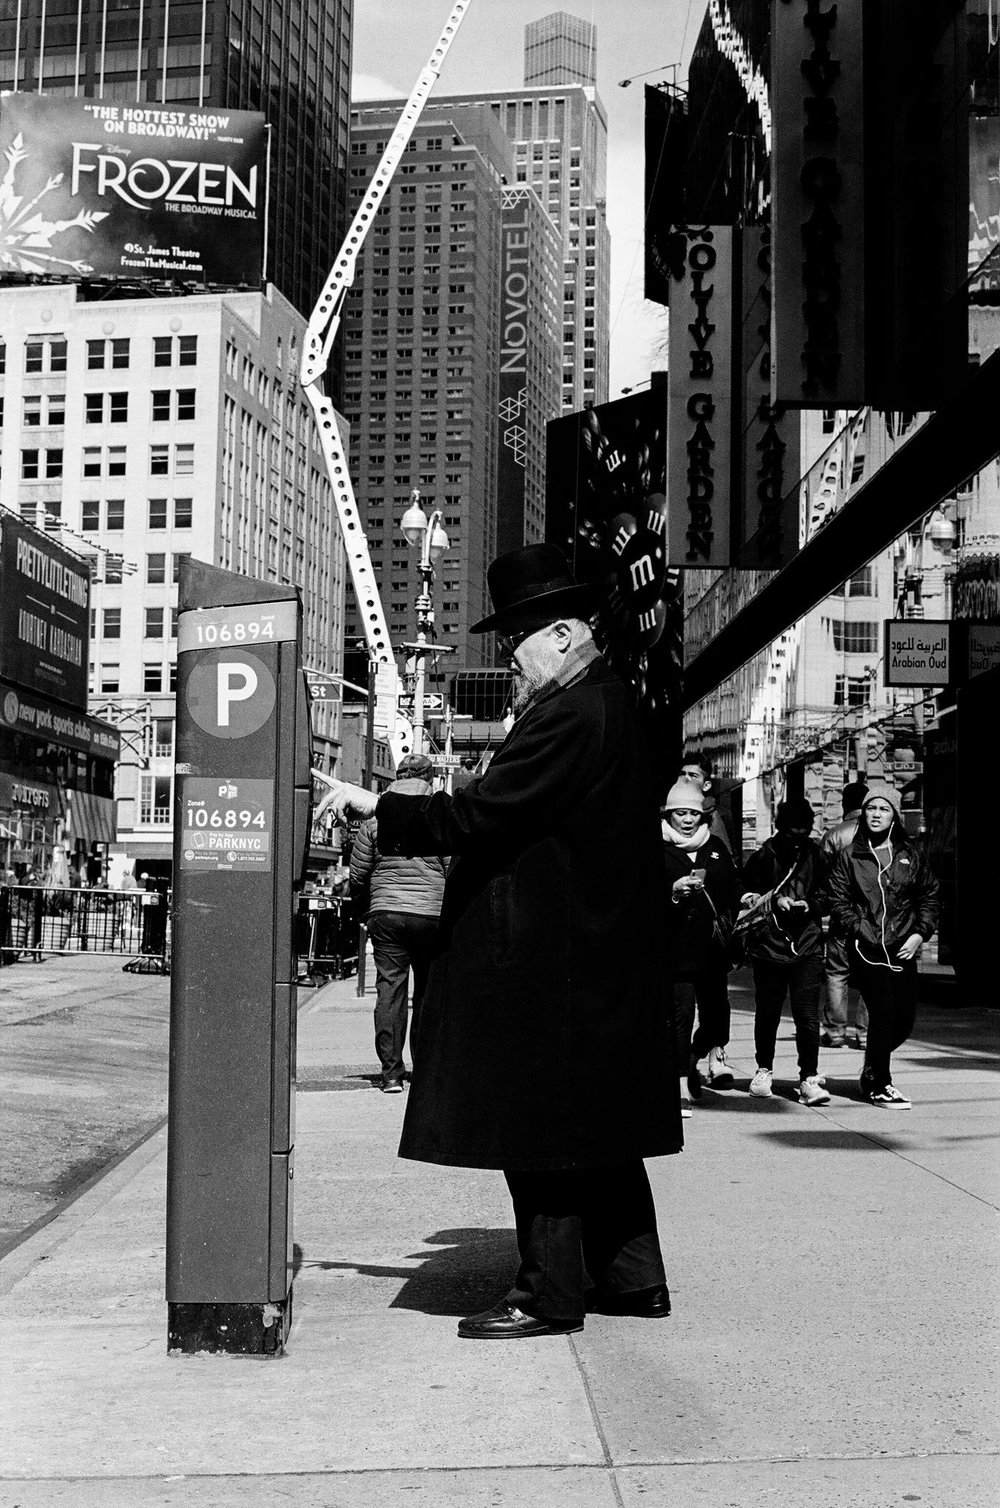 urban_street_photography_22.jpg